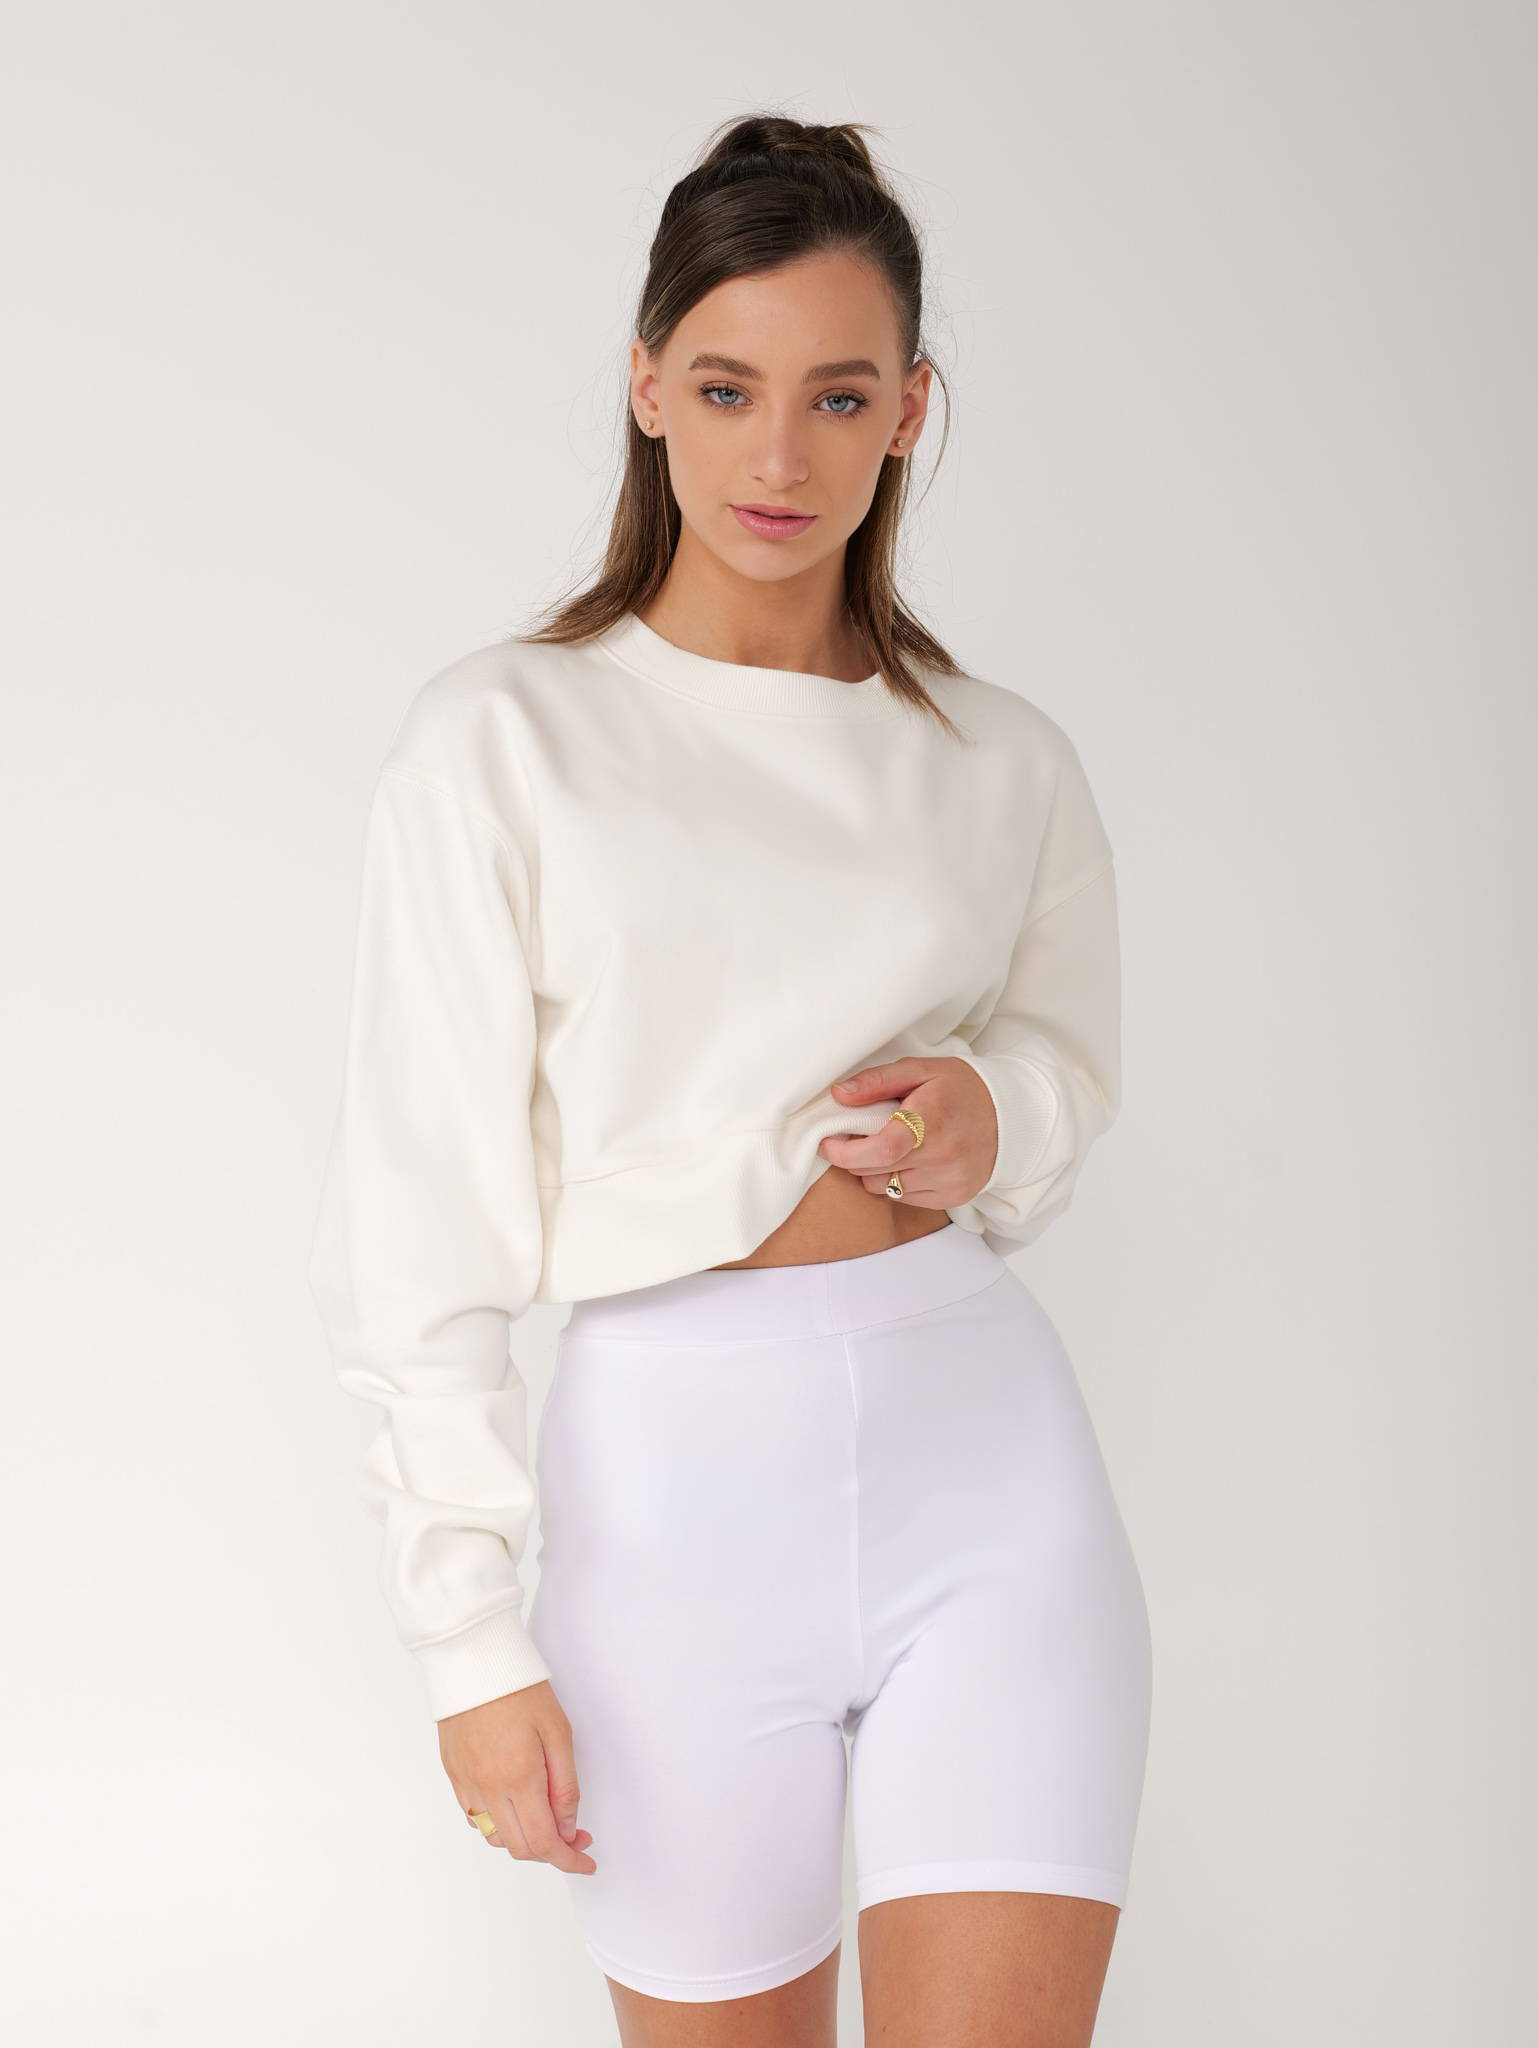 blank clothing loungewear